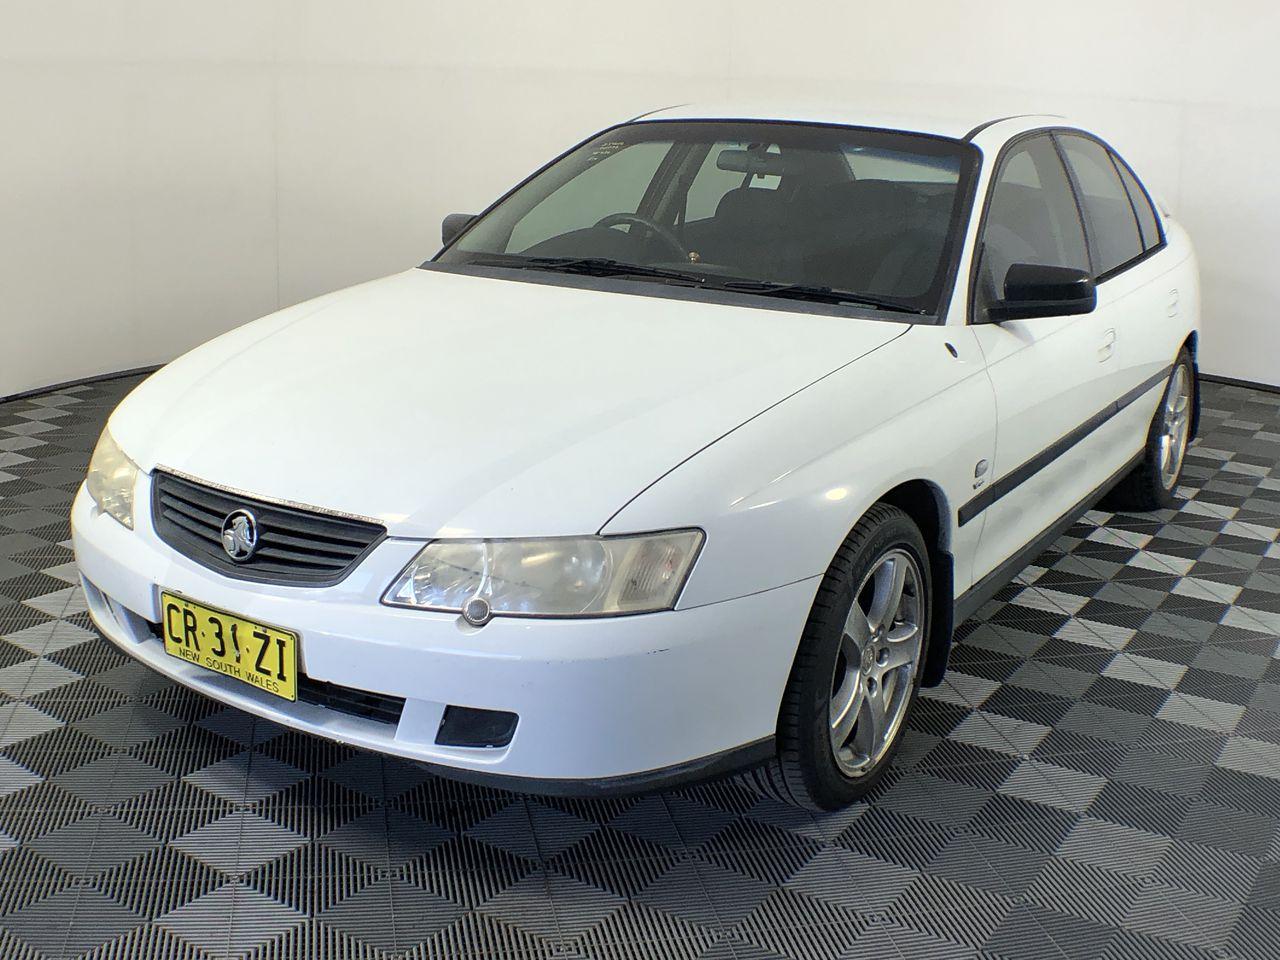 2003 Holden Commodore Executive Y Series Manual Sedan